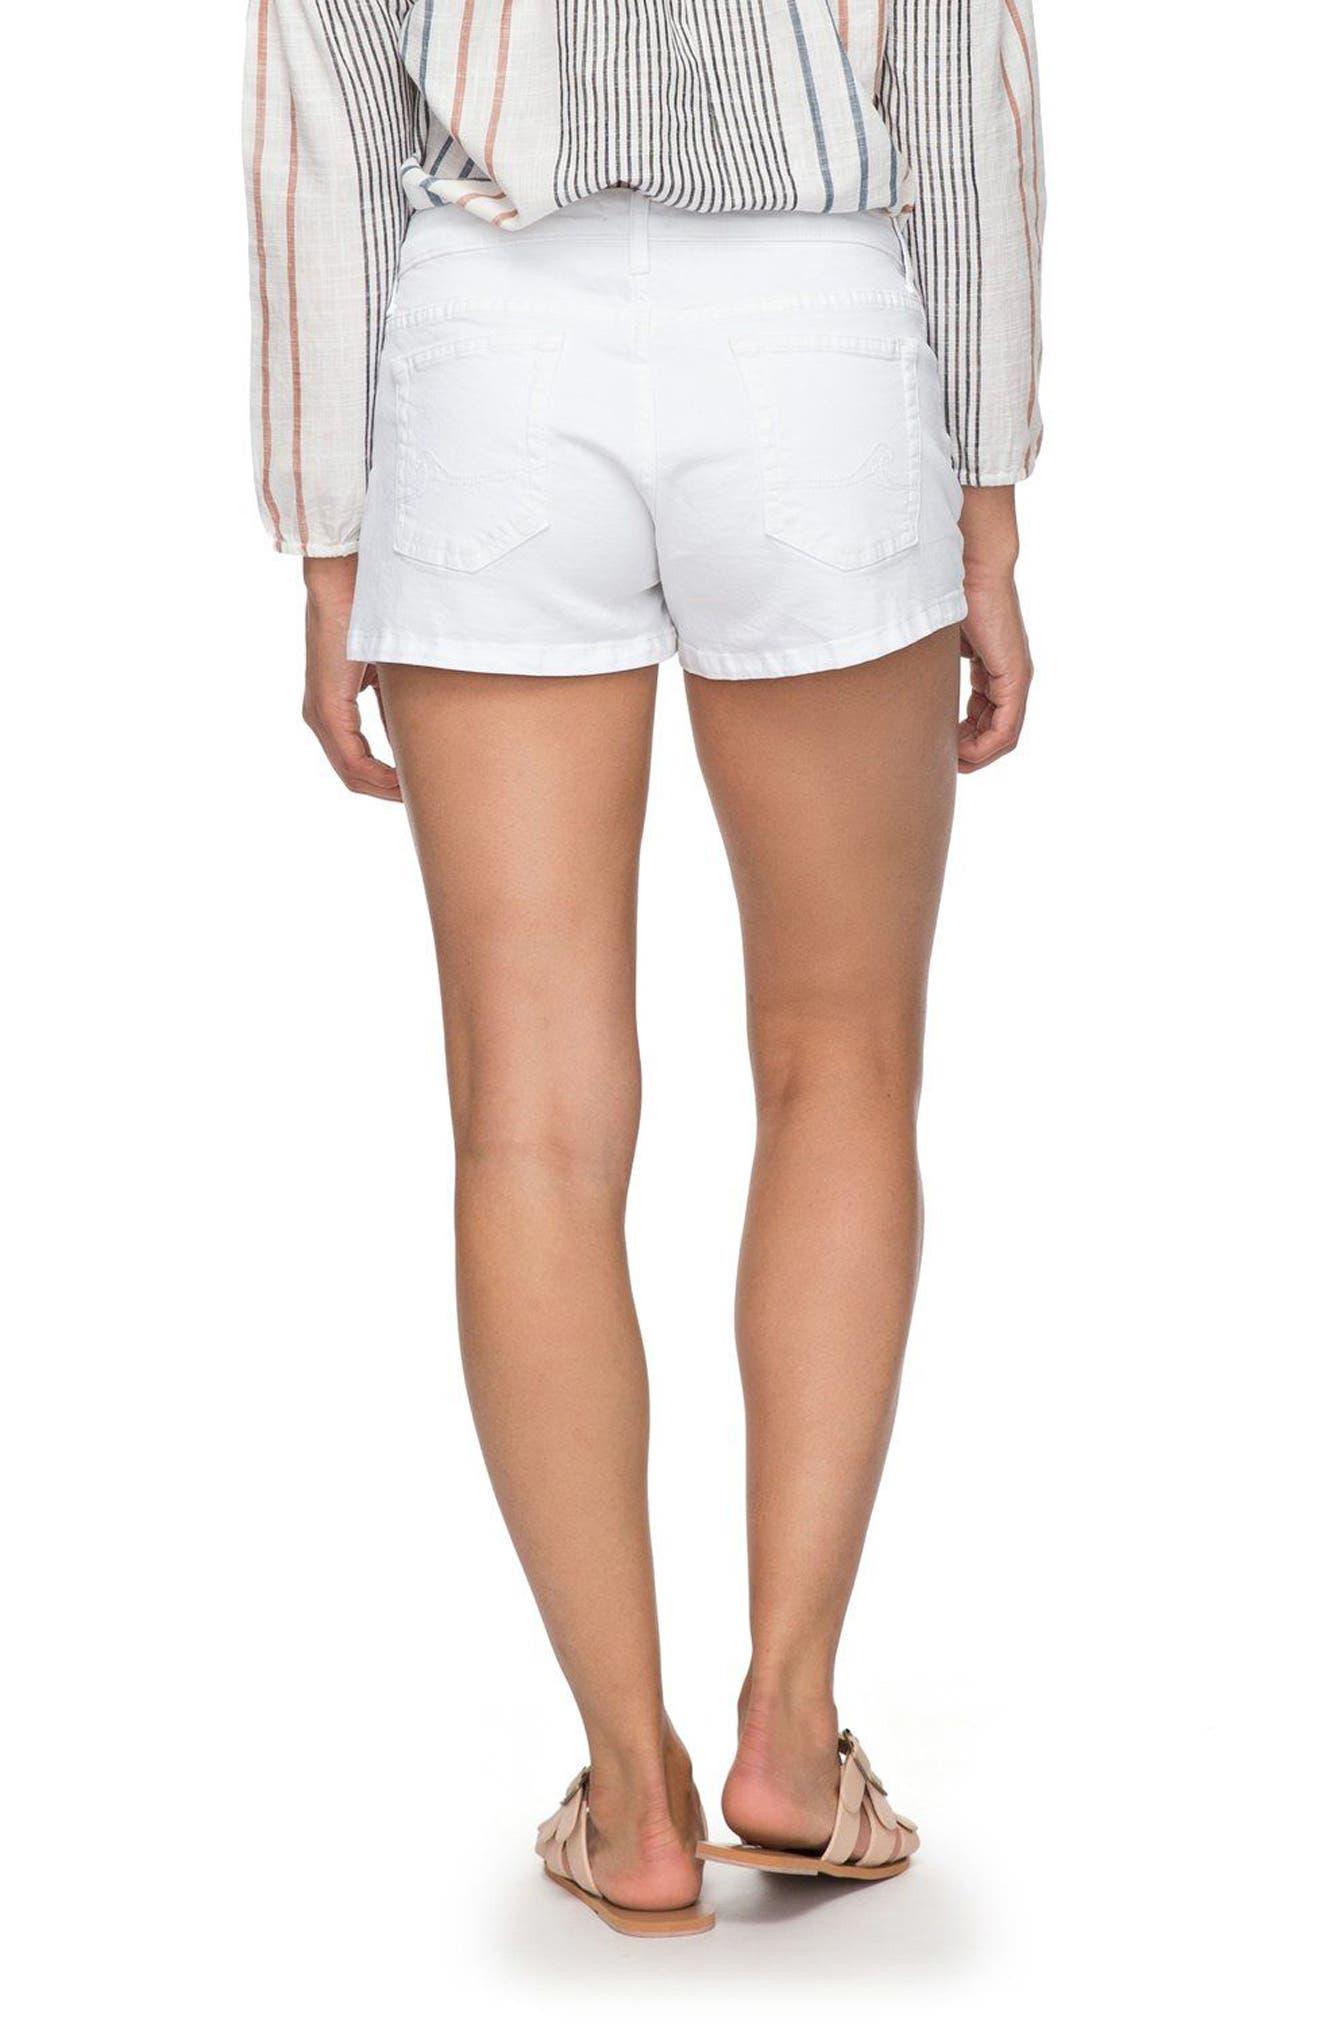 Seatripper Denim Shorts,                             Alternate thumbnail 3, color,                             White